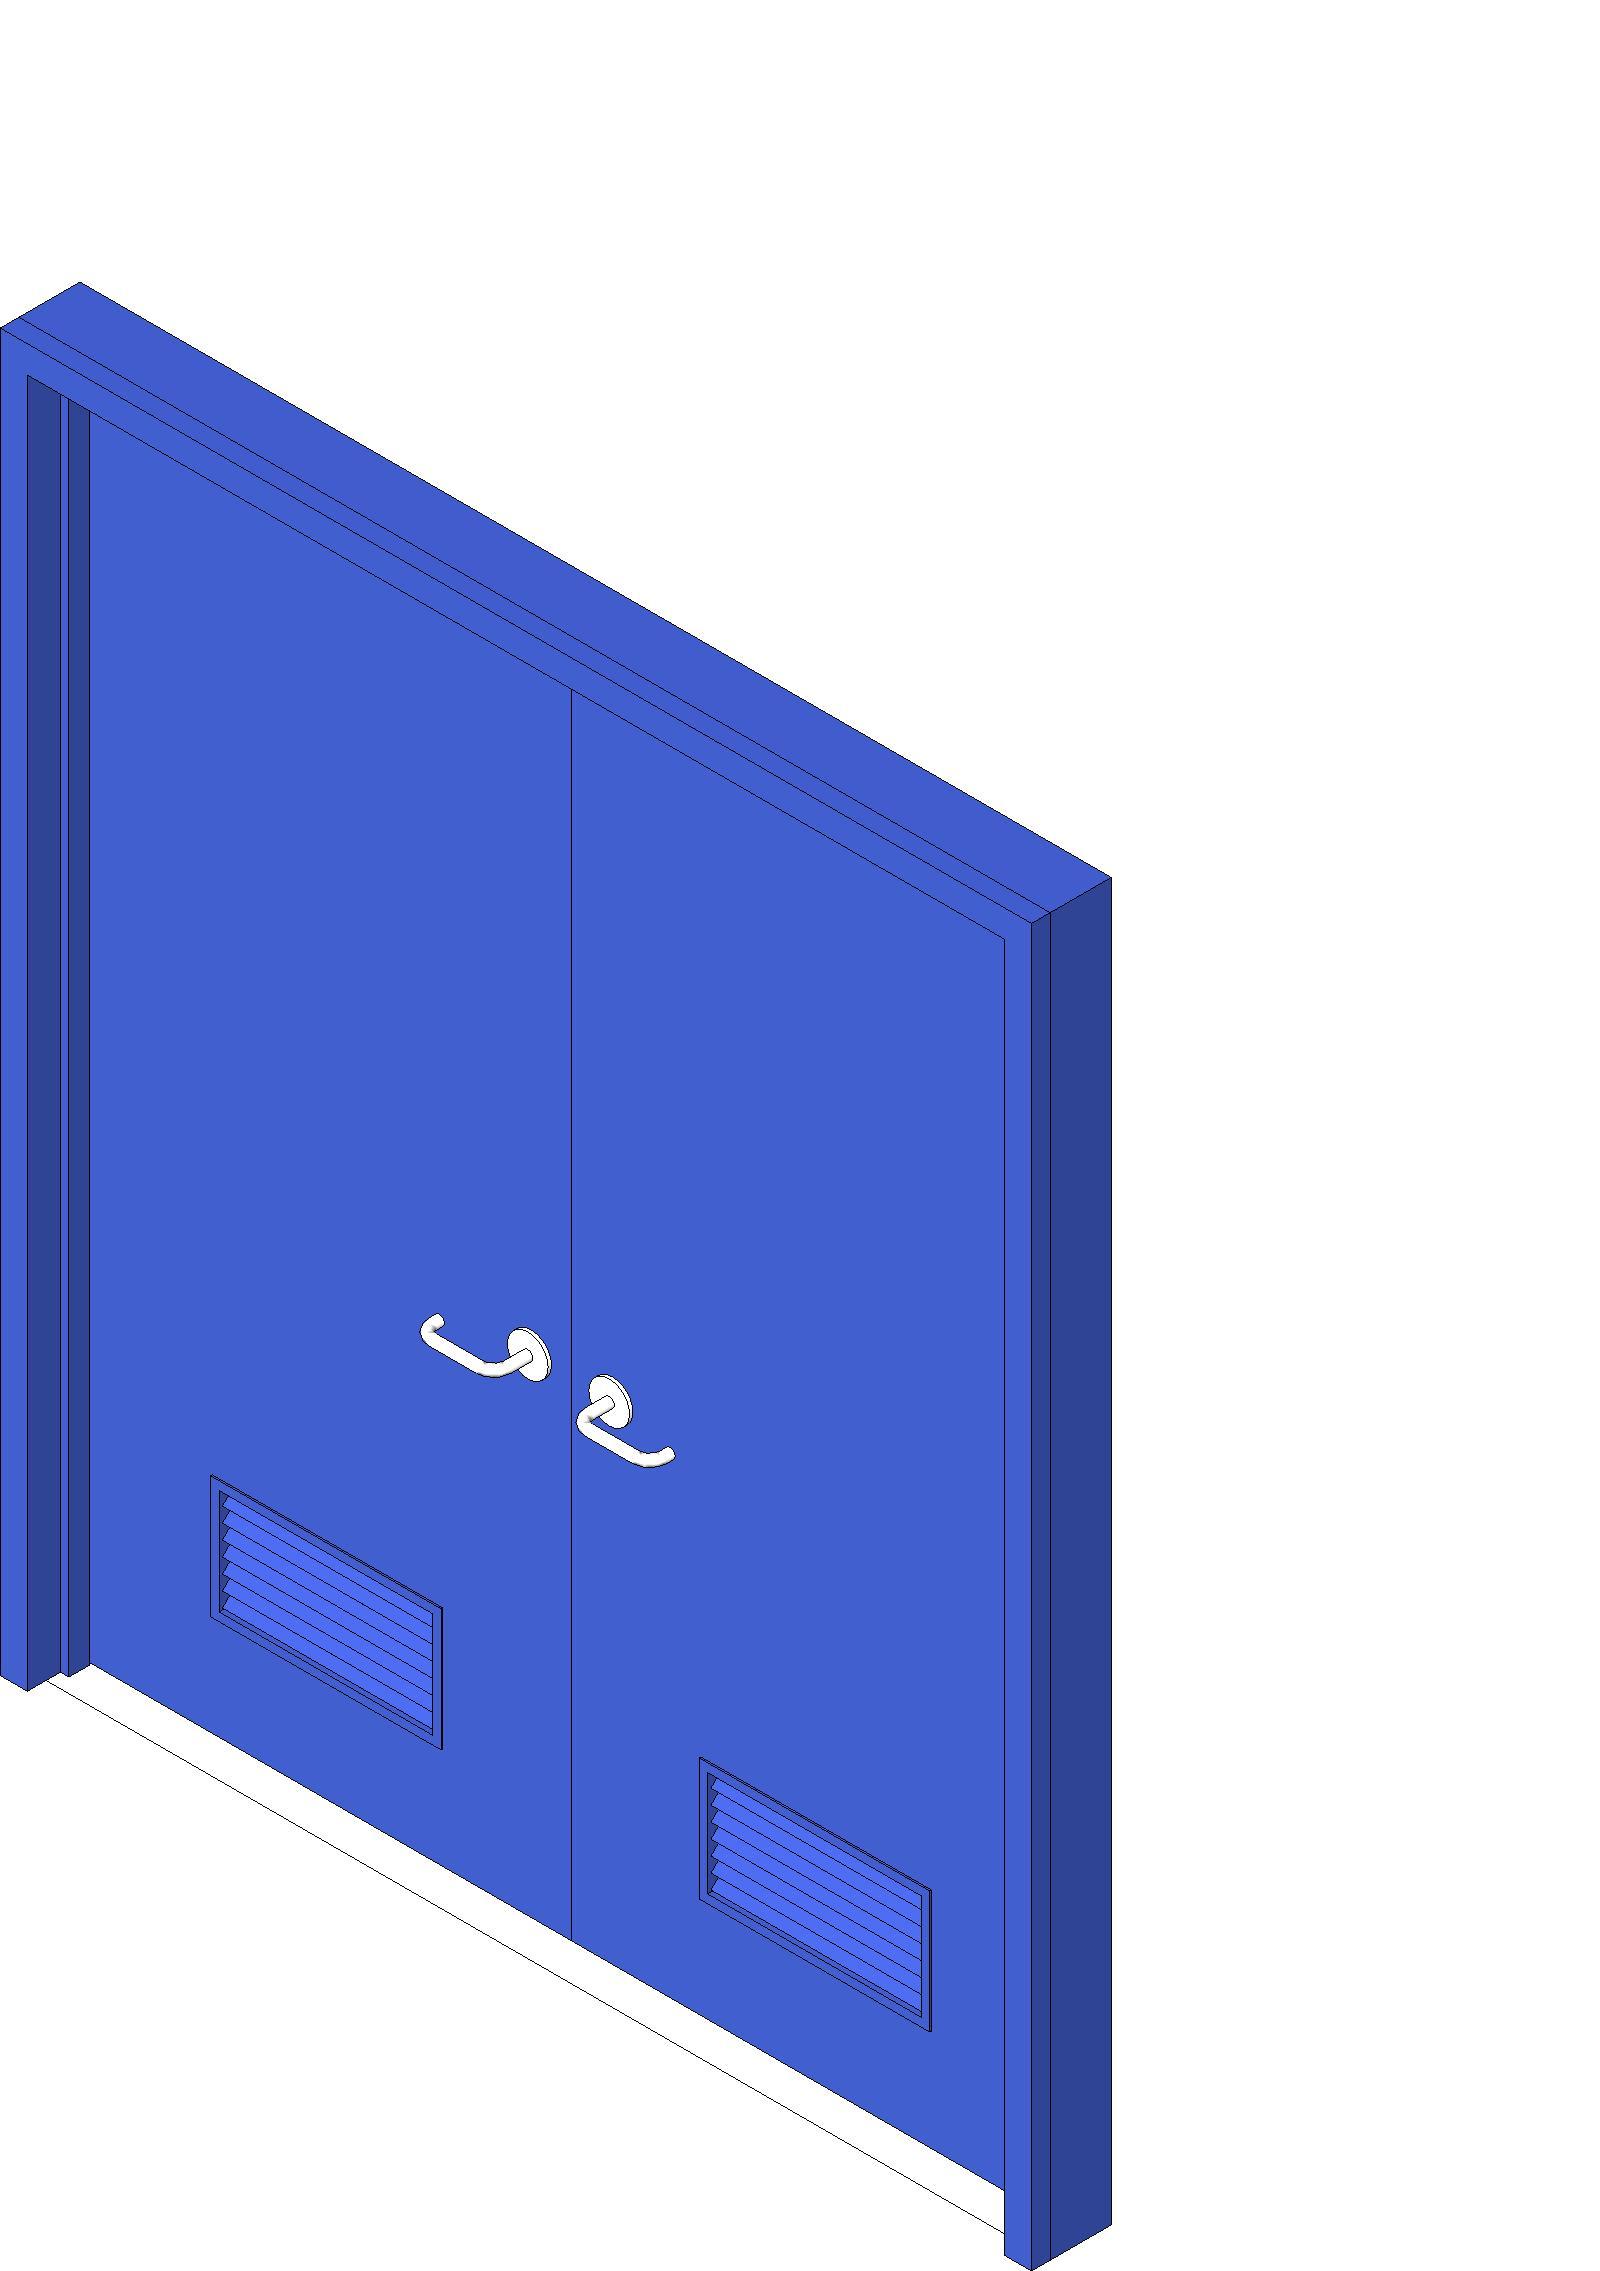 Louver Doors Revit Amp Jazo Screenshot 007 Png Sc 1 St